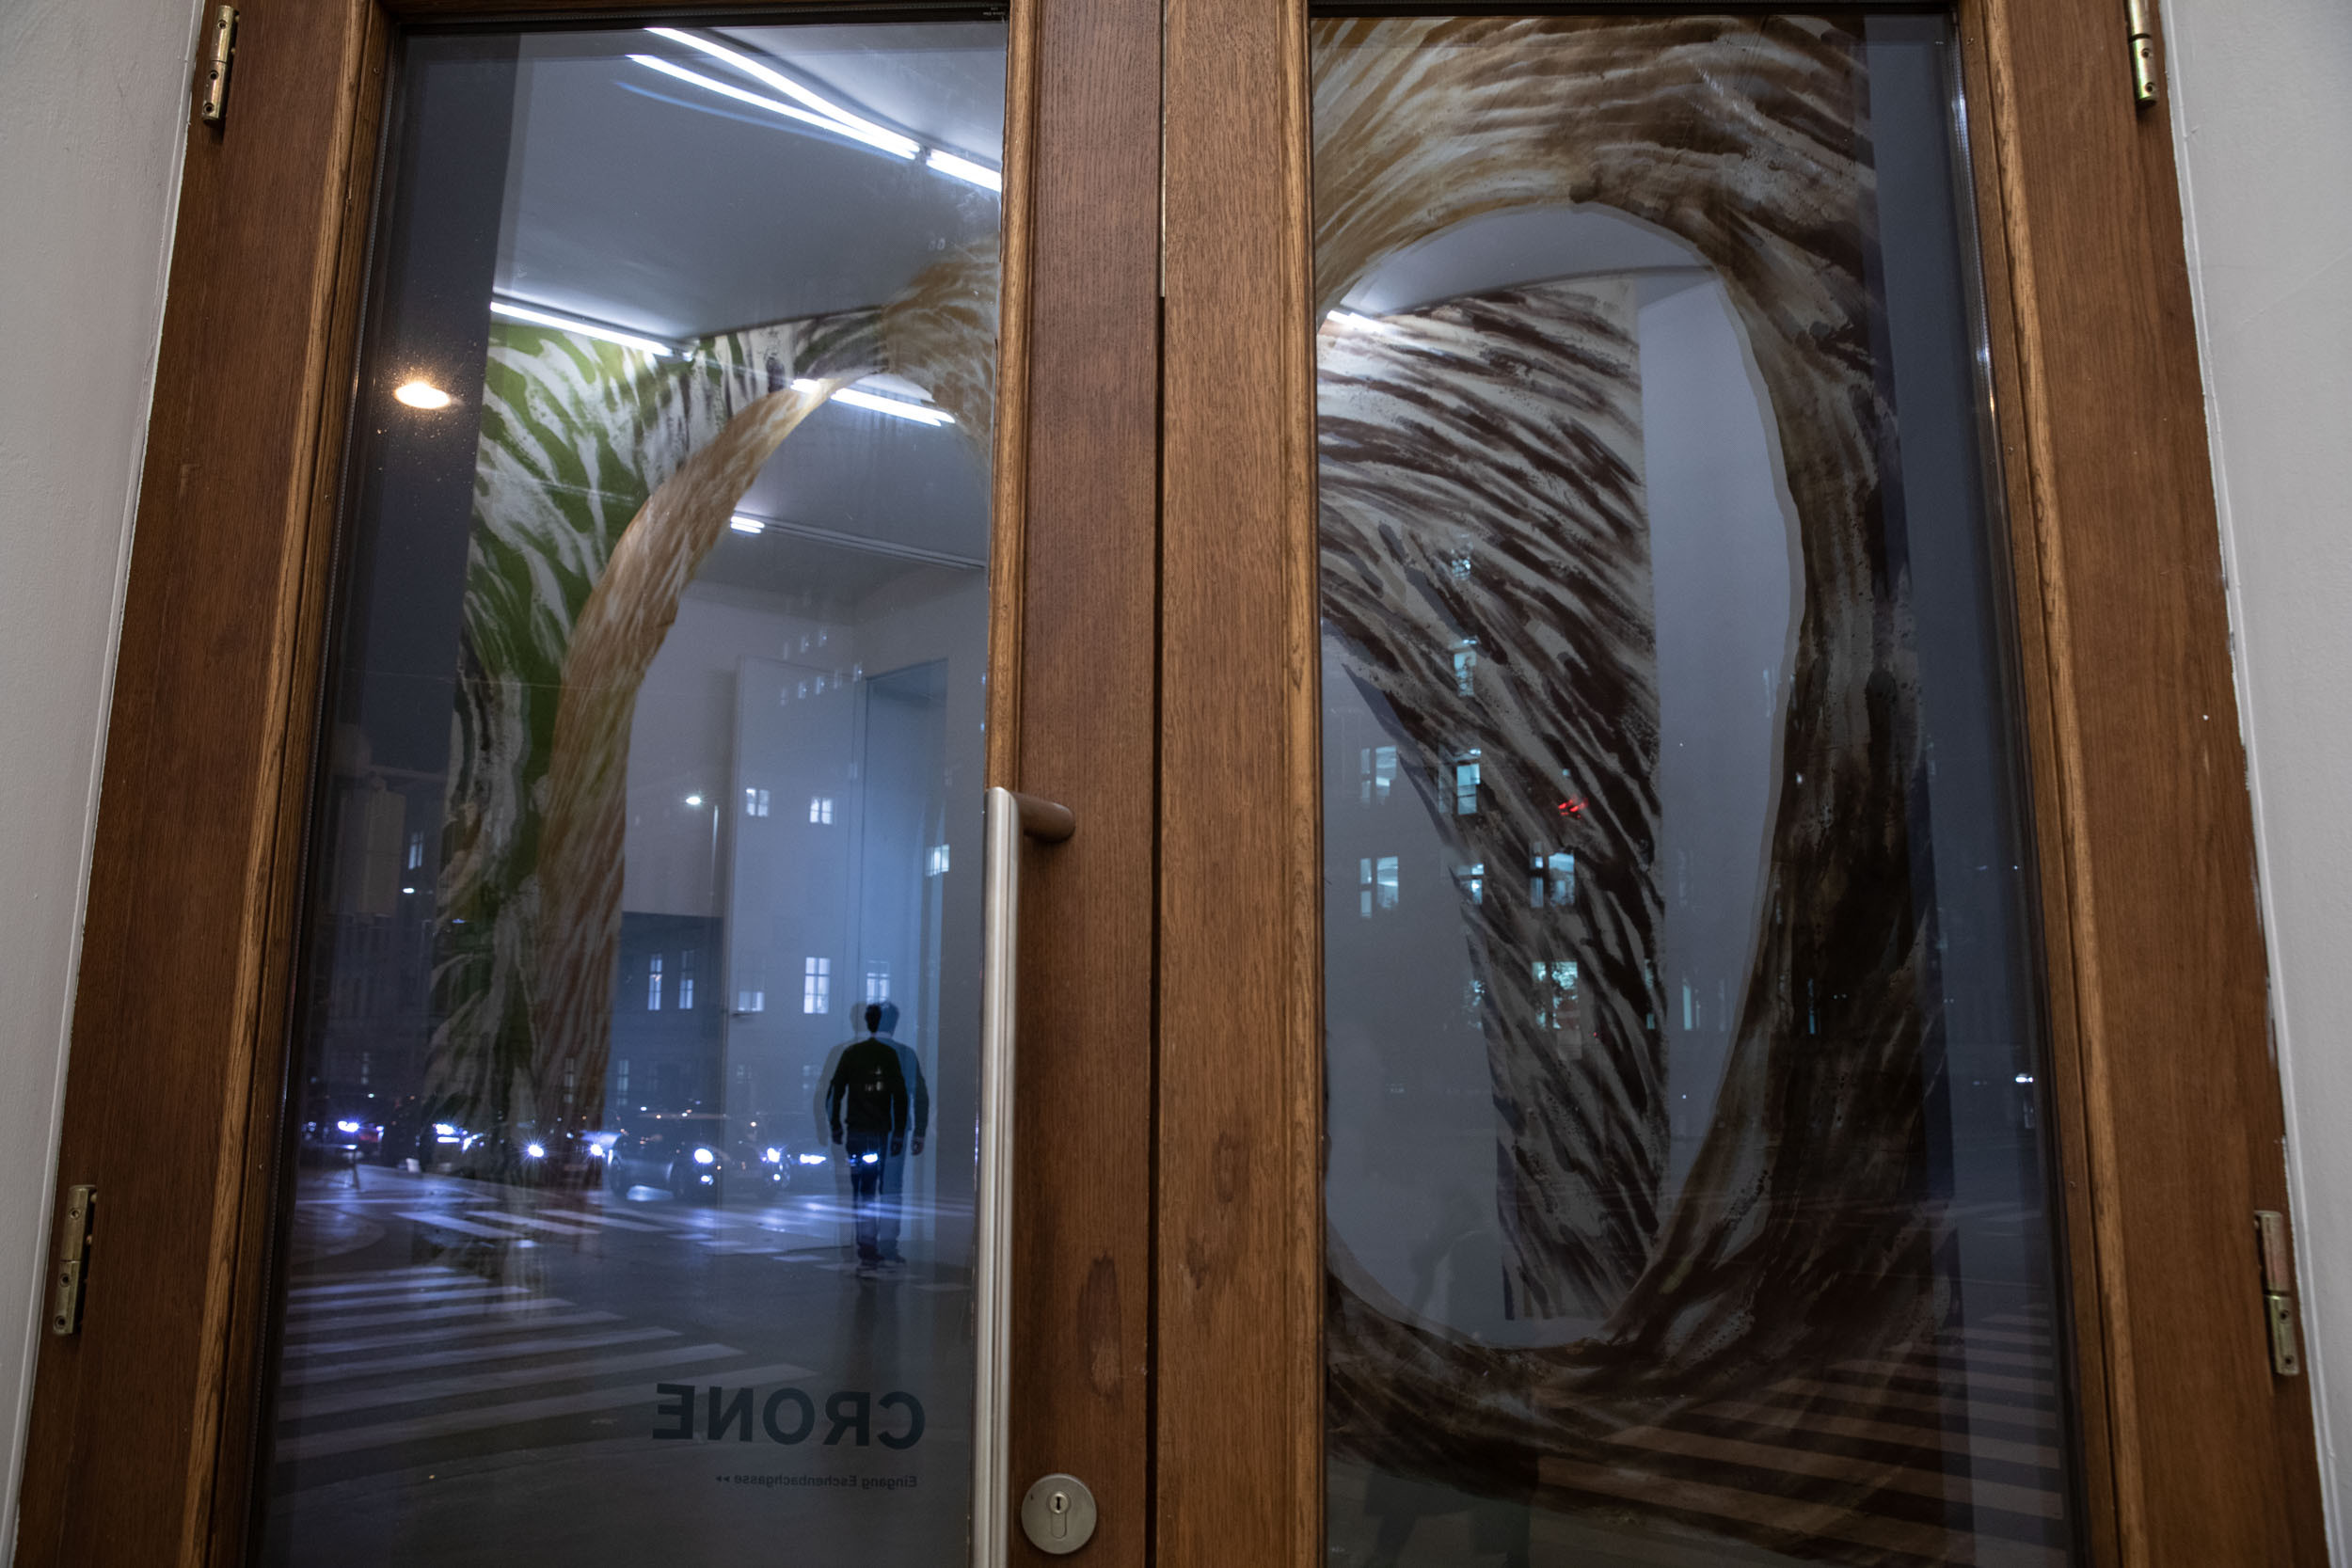 foto.esel.at: Stefan Reiterer: Displacement (Galerie Crone Wien, 22.10. - 31.12.2020)